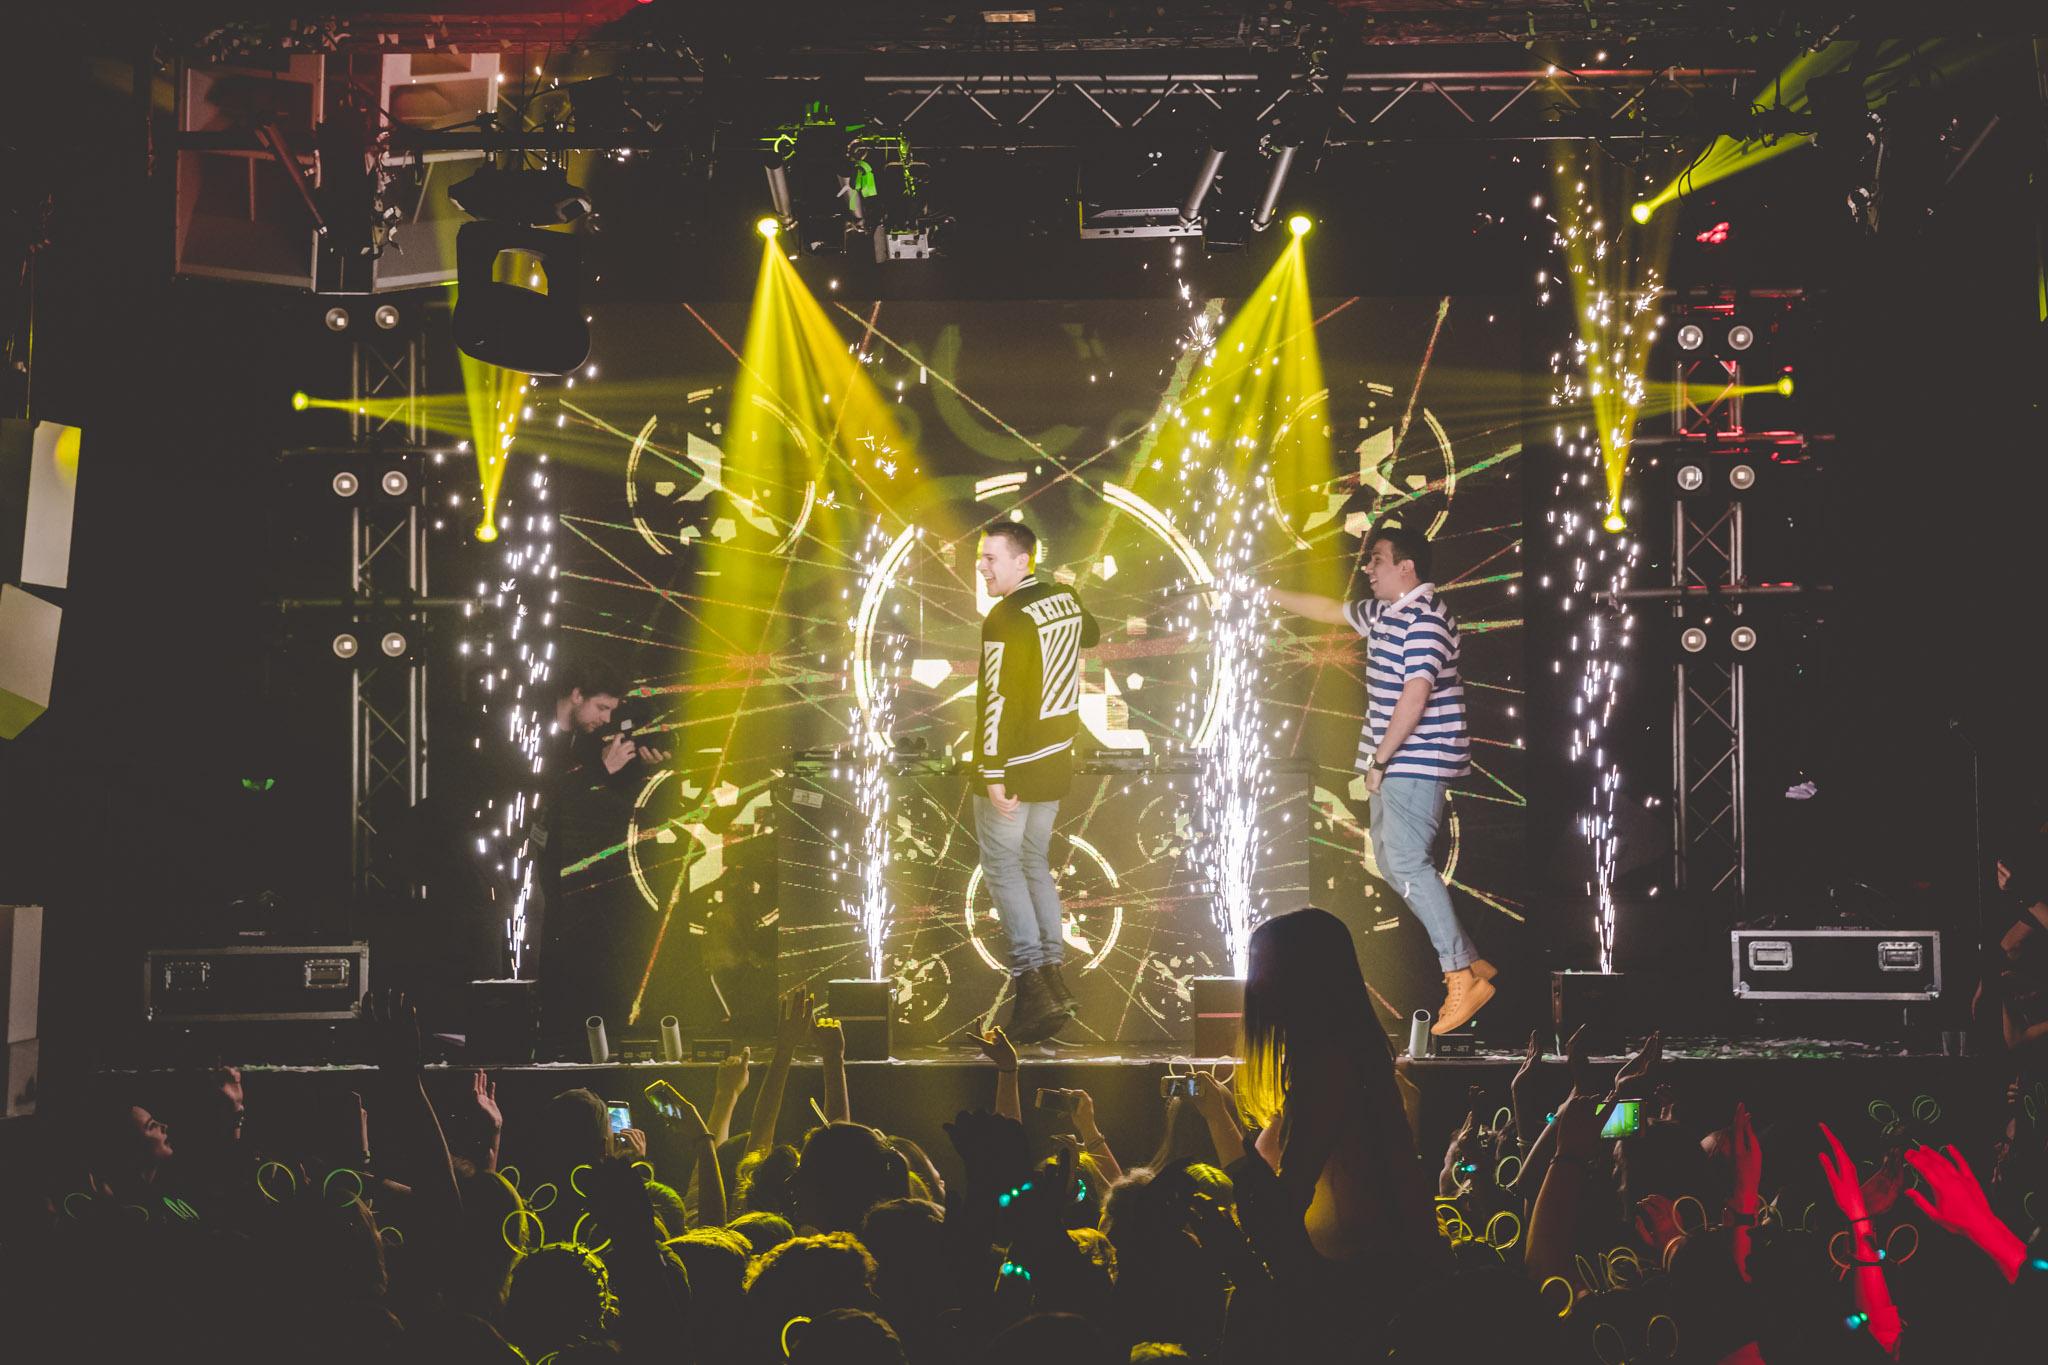 #Sendepause 2018 mit Felix Jaehn und Adam Trigger (© Julian Huke Photography)